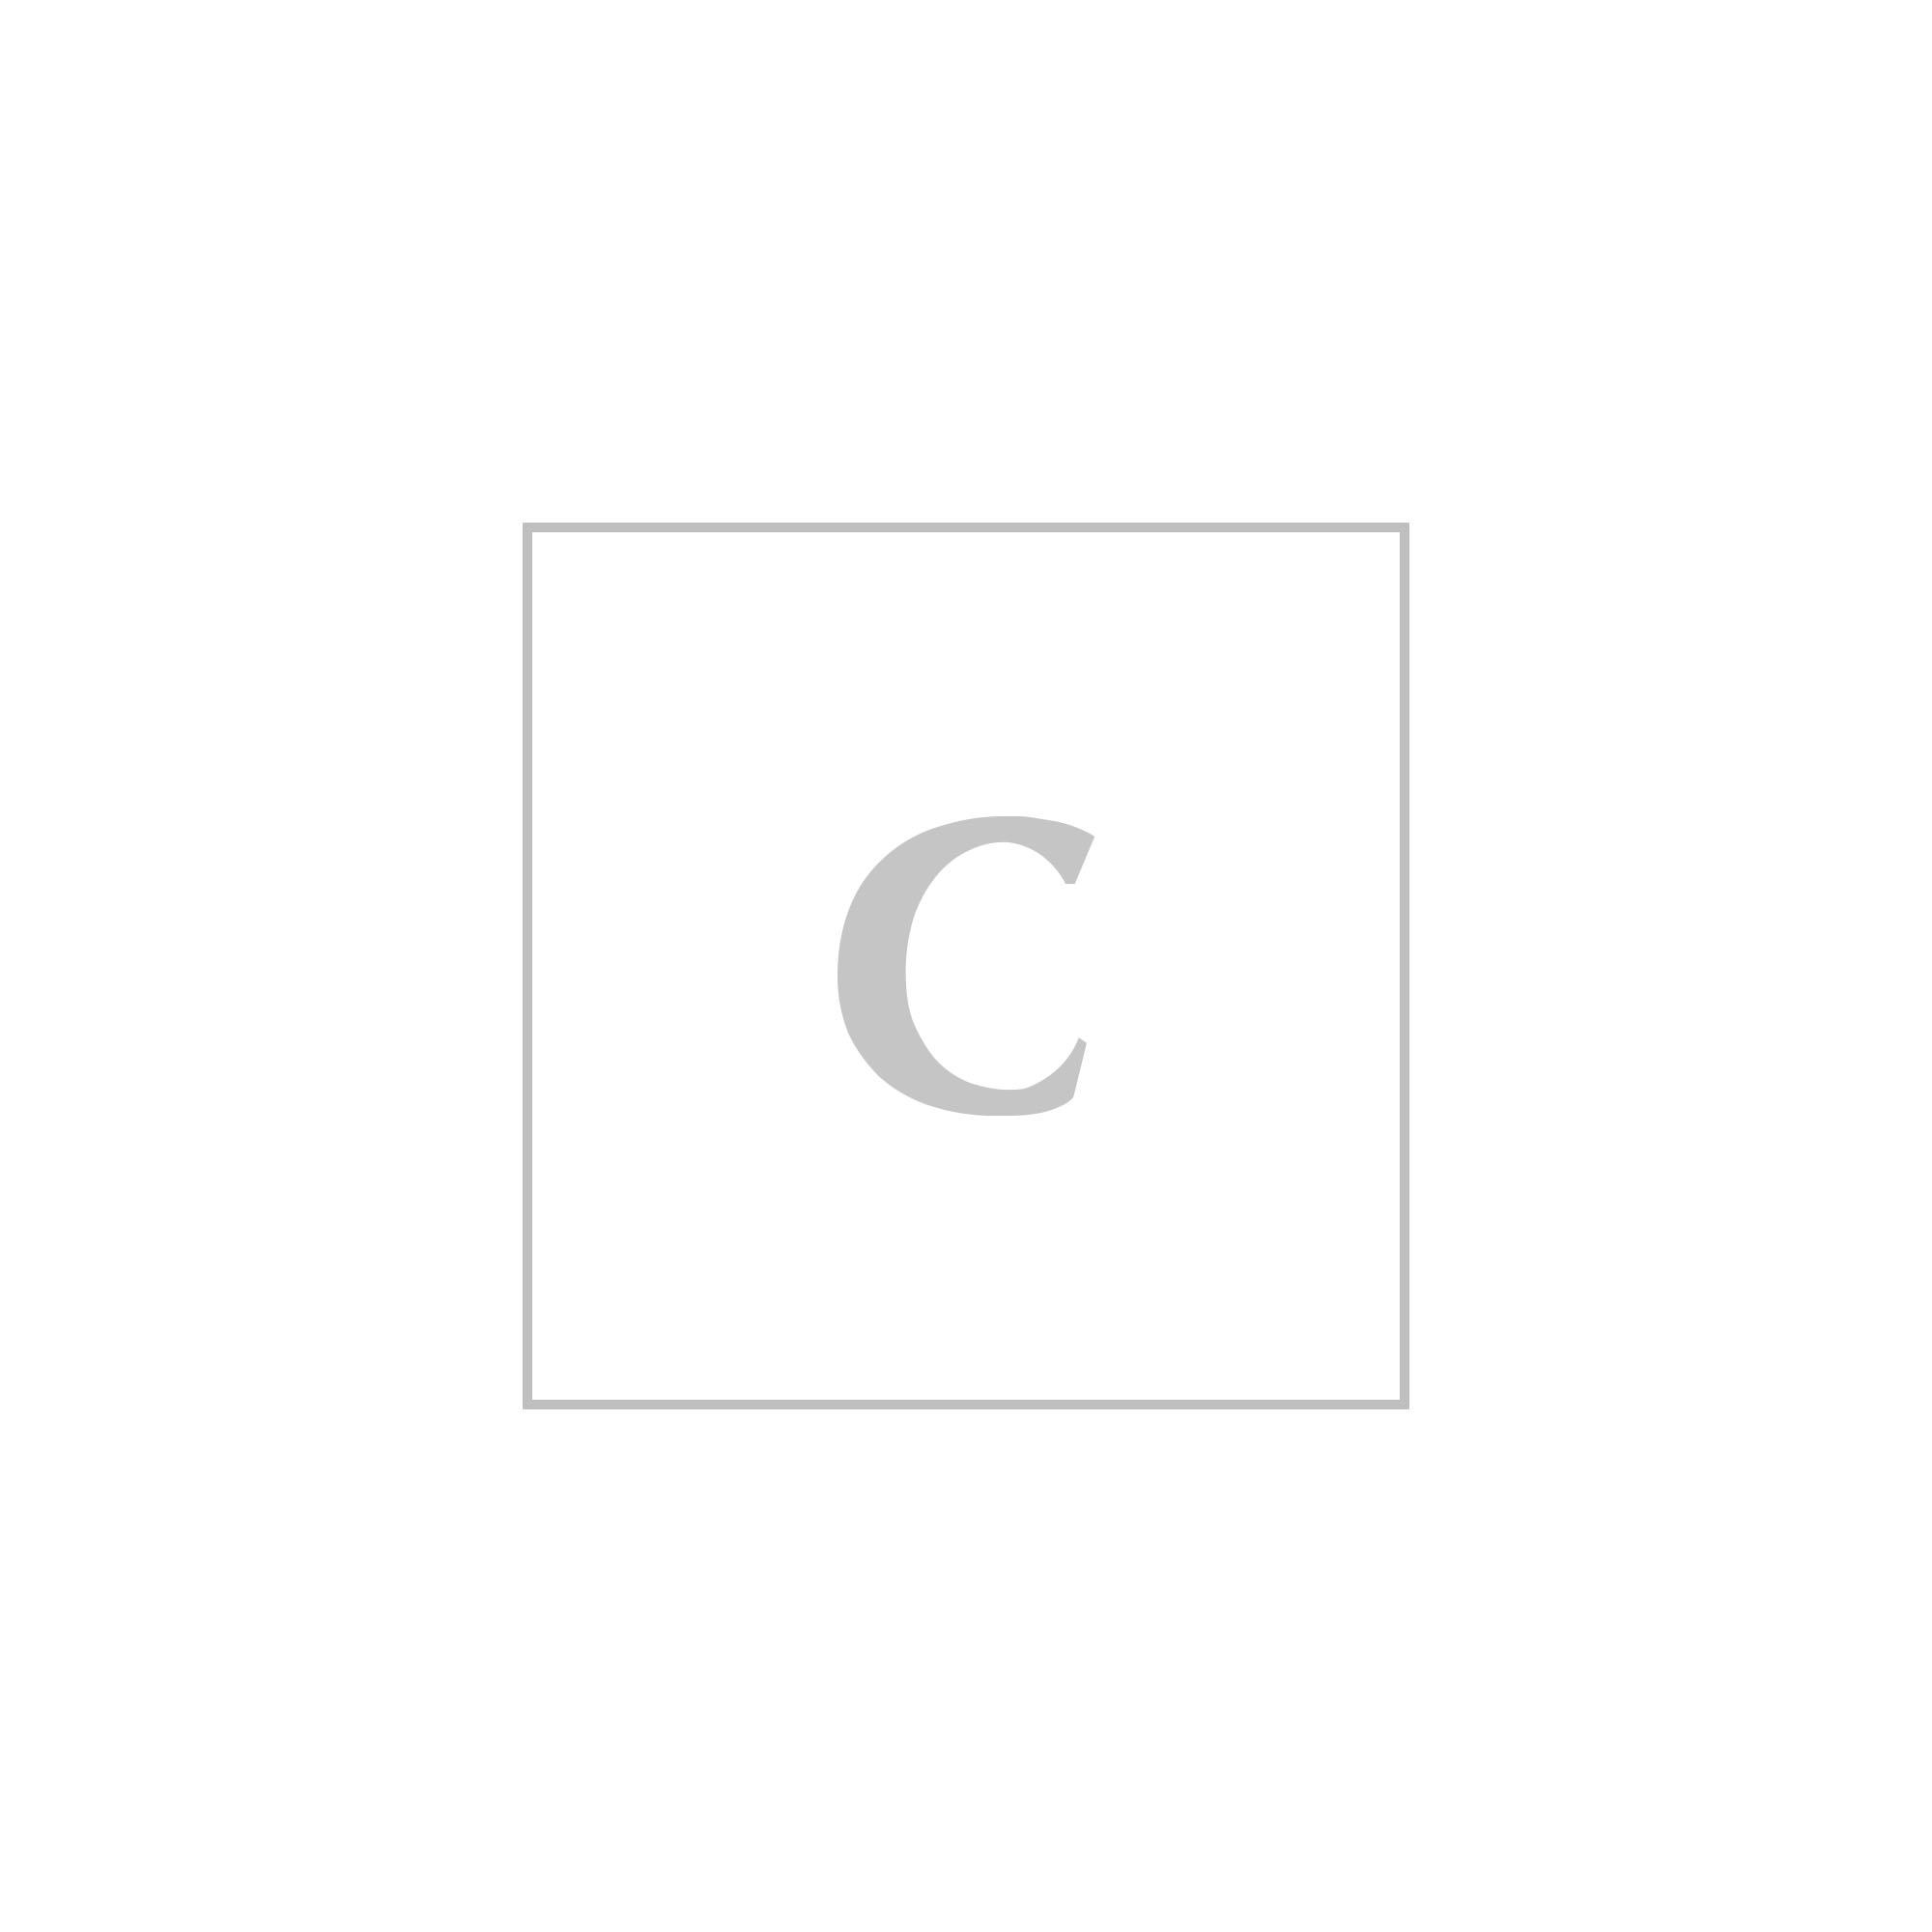 Dolce & gabbana love leather cardholder